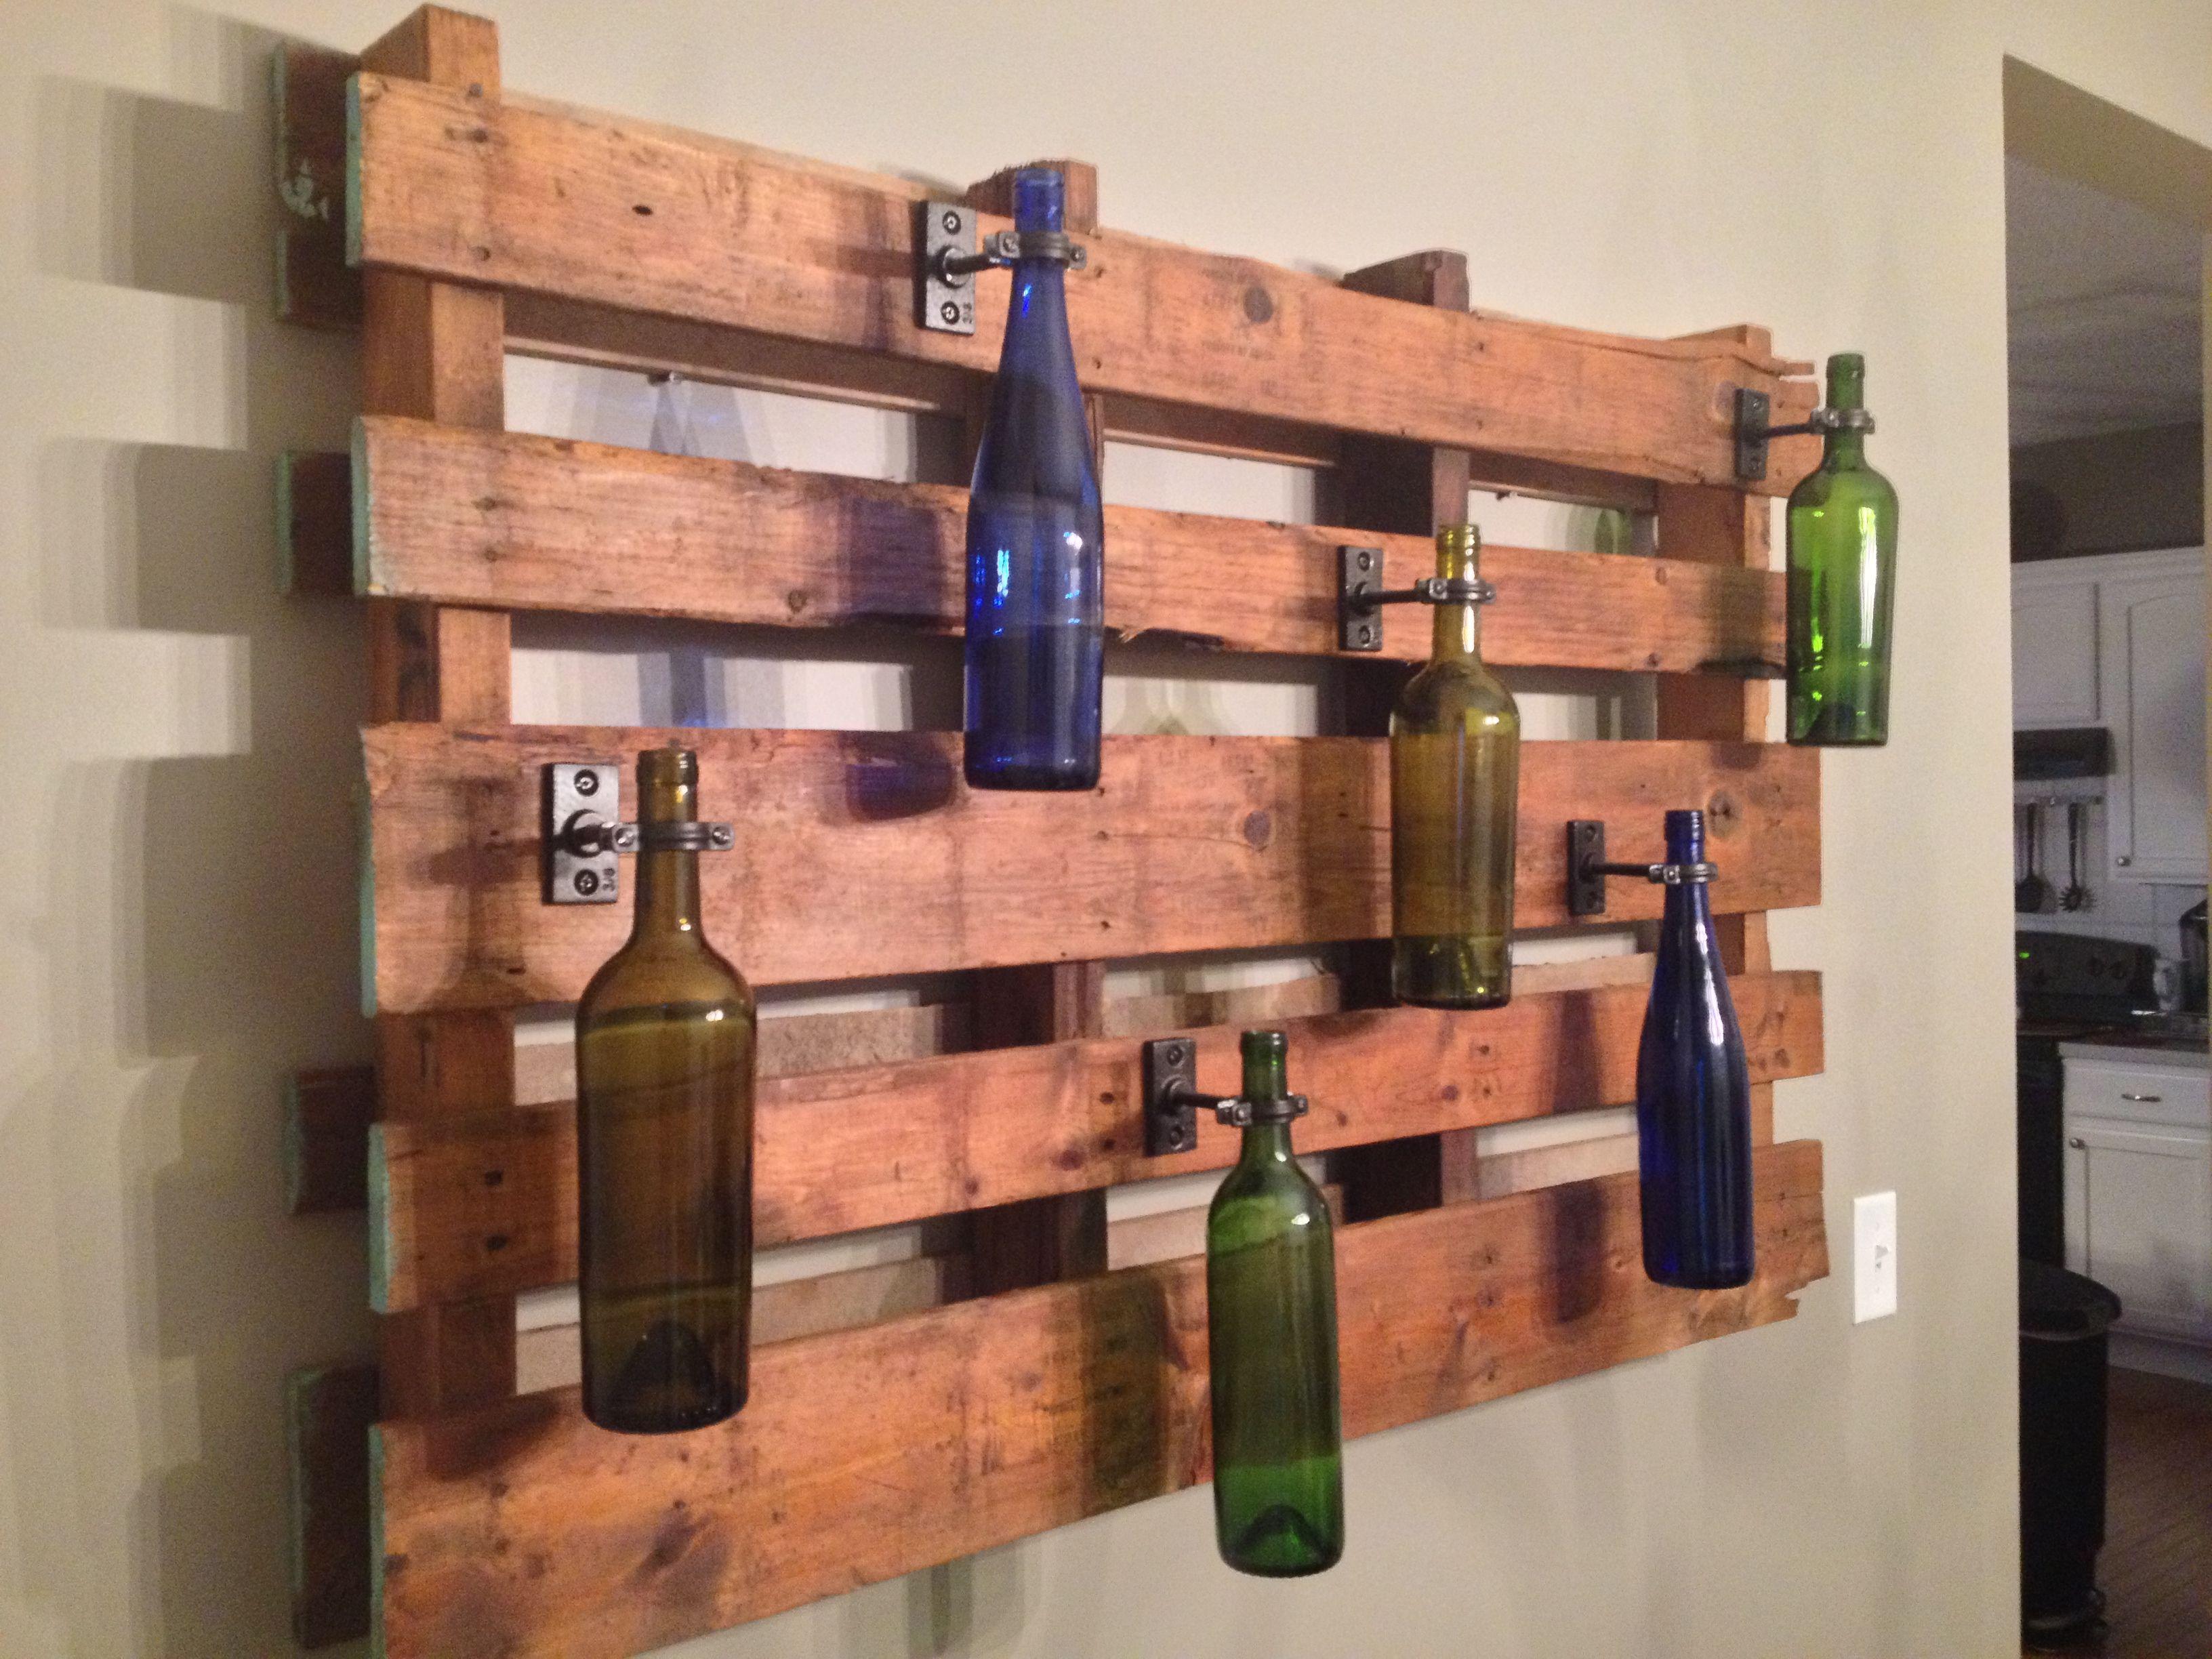 Wood Pallet Decor Great For Outside Lighting Diy Pallet